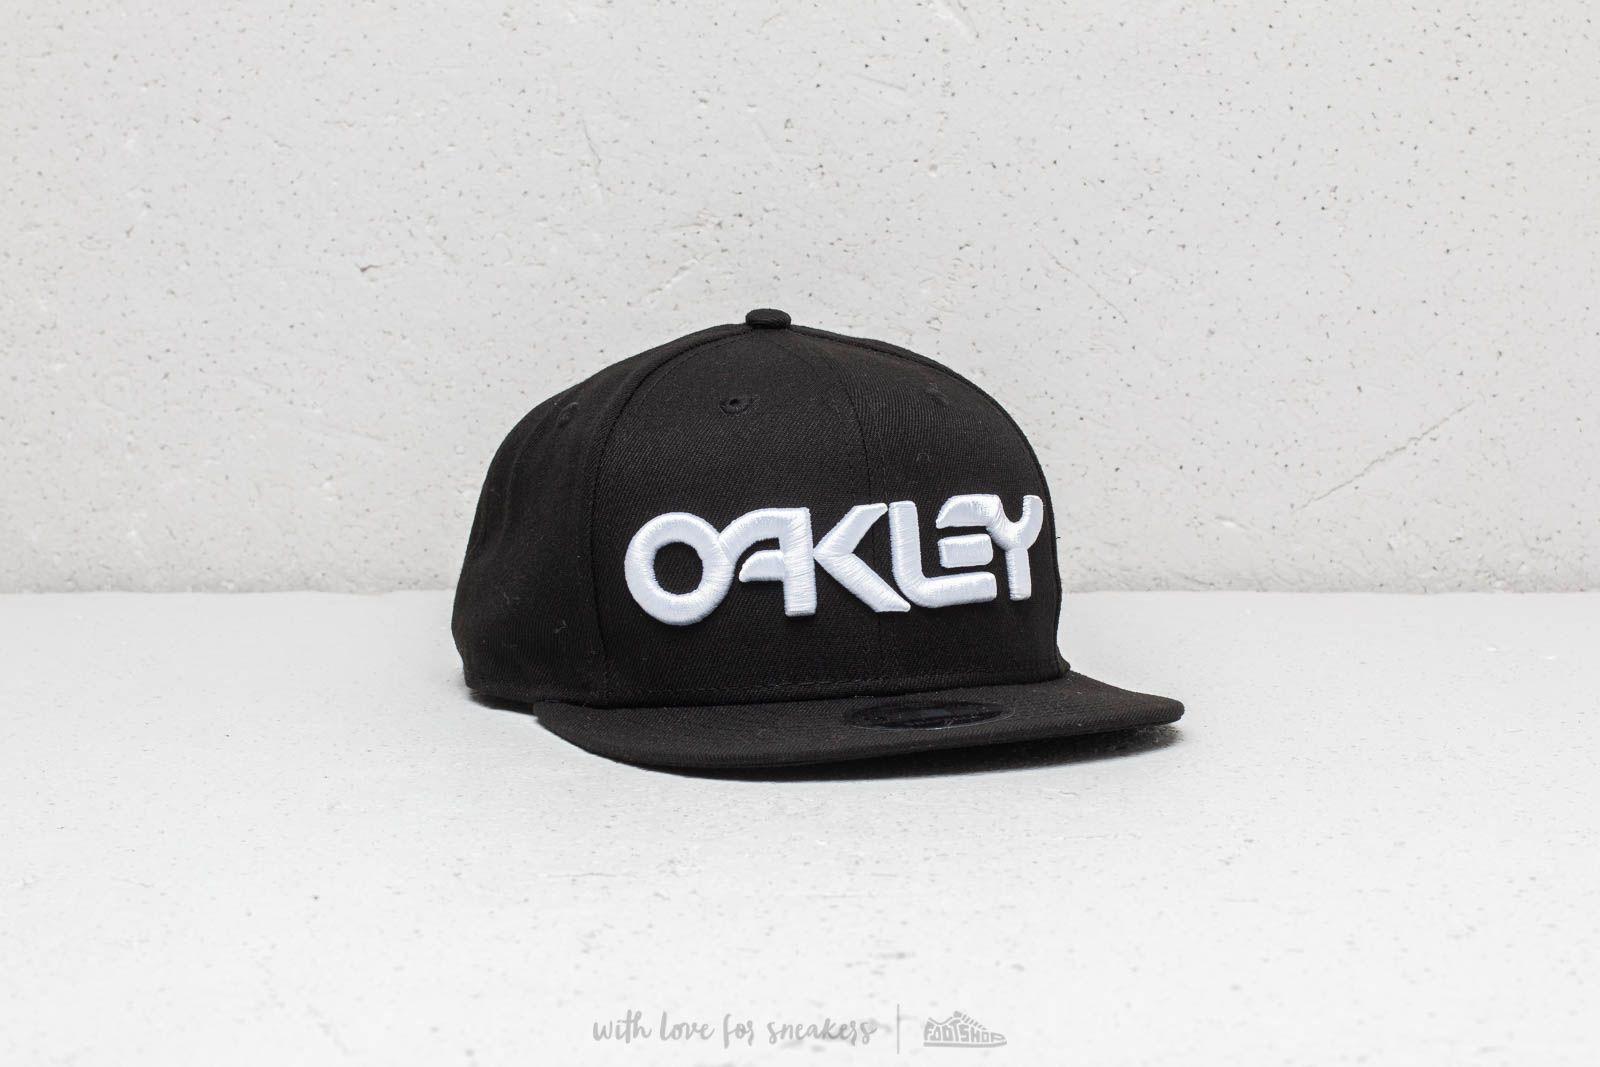 7648e852439 Oakley Mark II Novelty Snap Cap Black at a great price  39 buy at Footshop